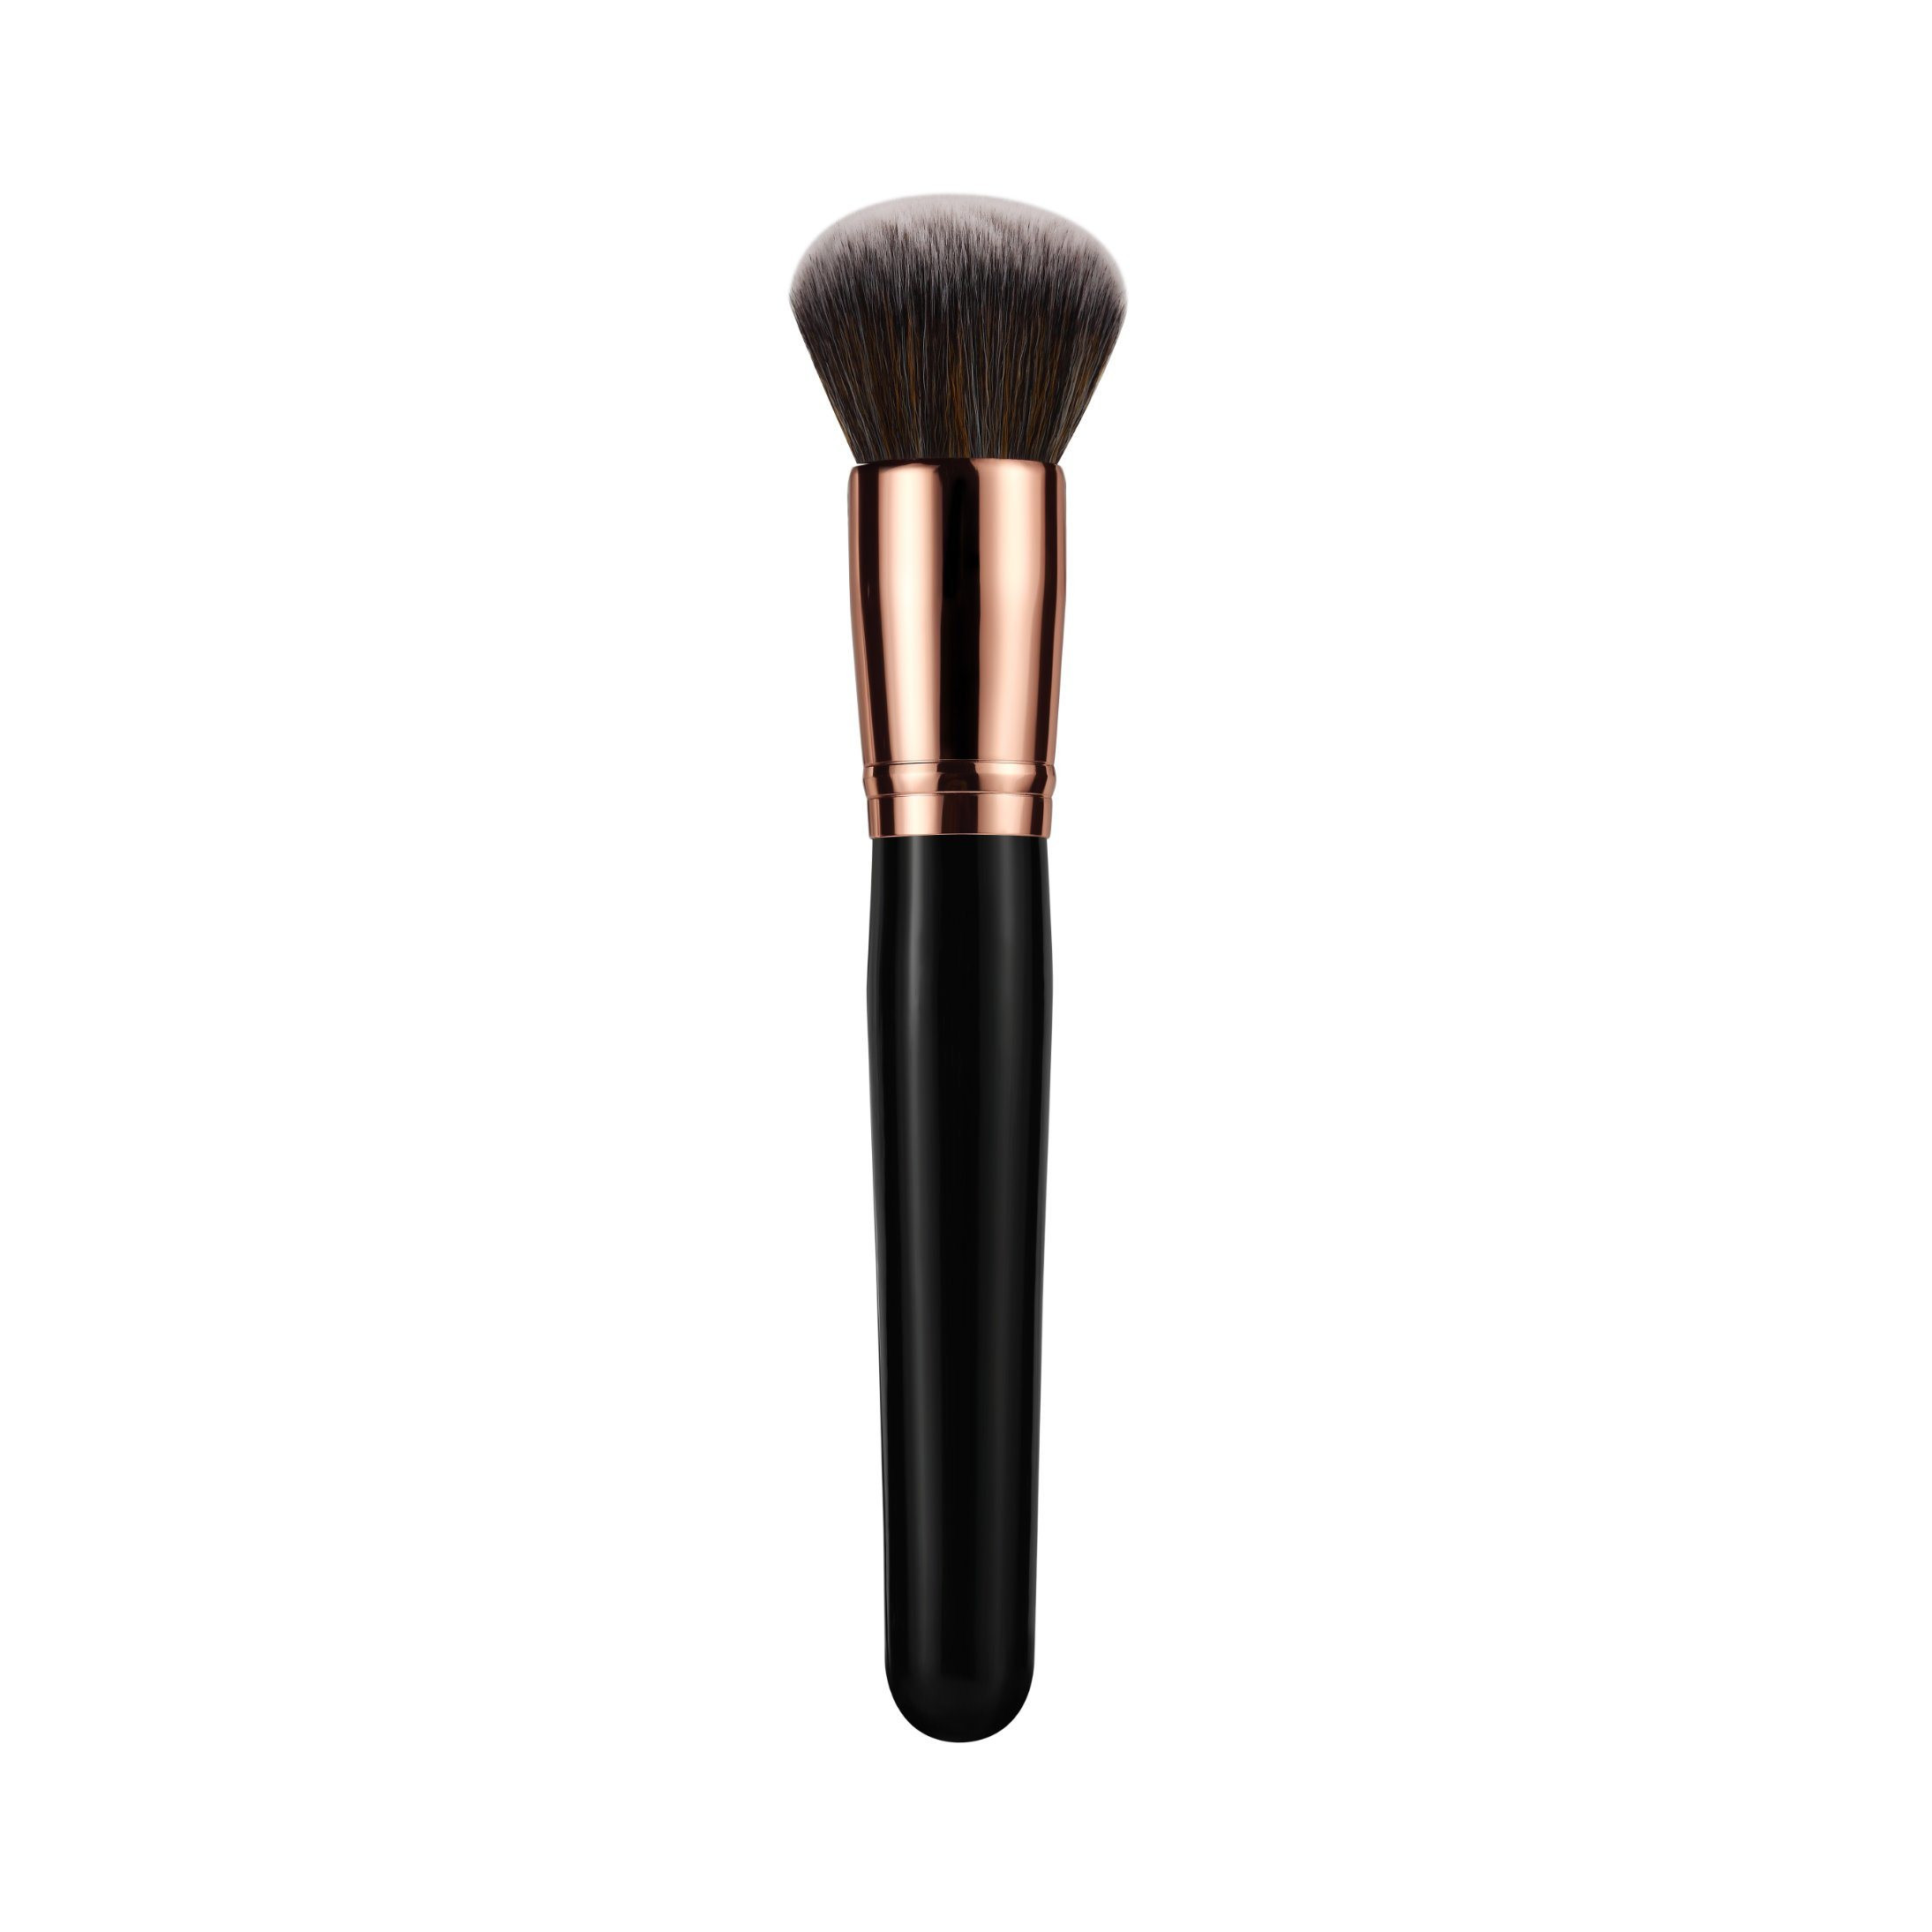 Wood Hand Synthetic Hair Makeup Brush Set